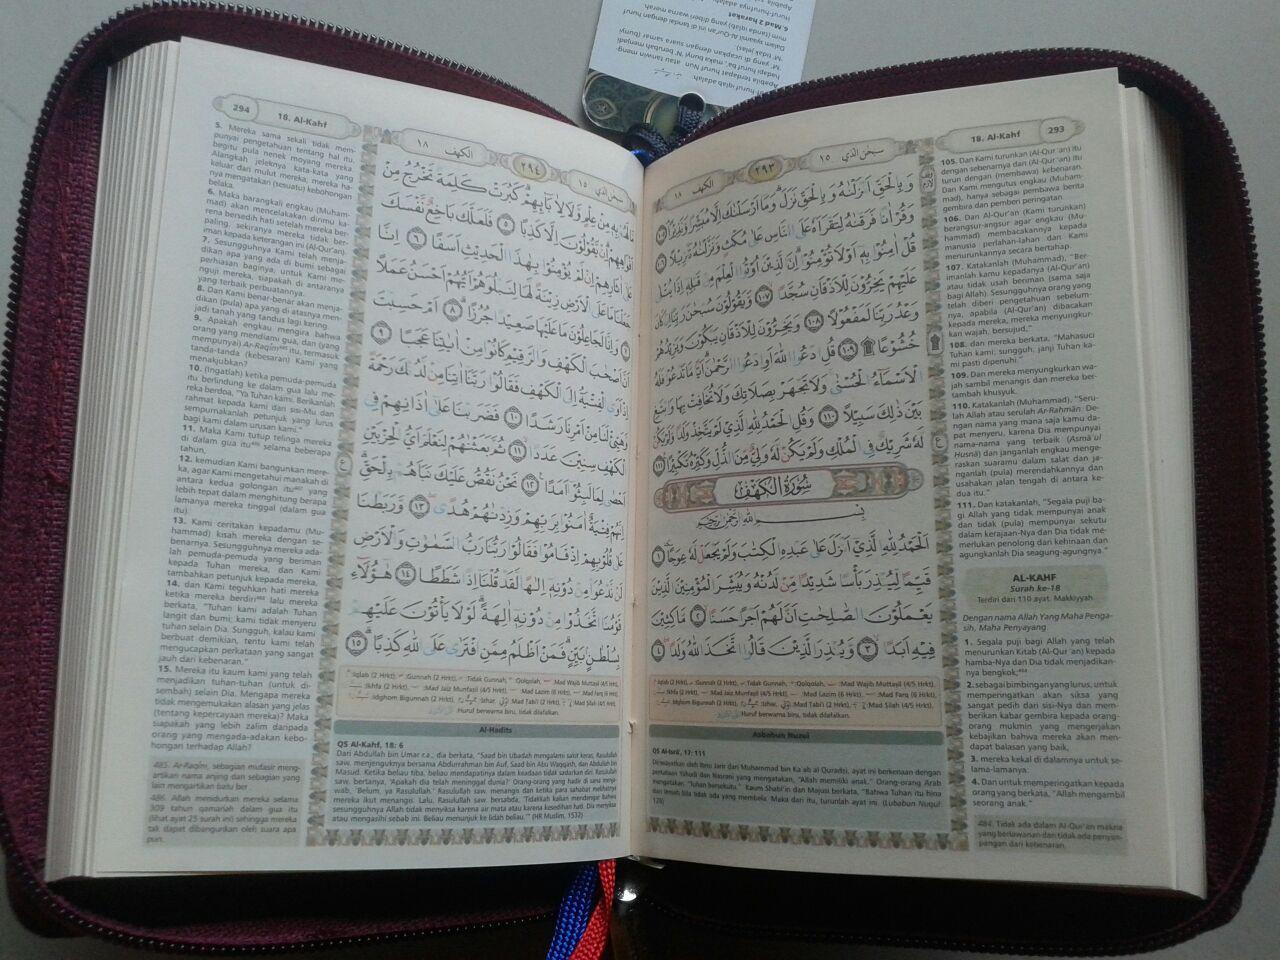 Al-Qur'an Terjemah Bukhara Syamil Ritsleting Tajwid Ukuran A6 isi 2